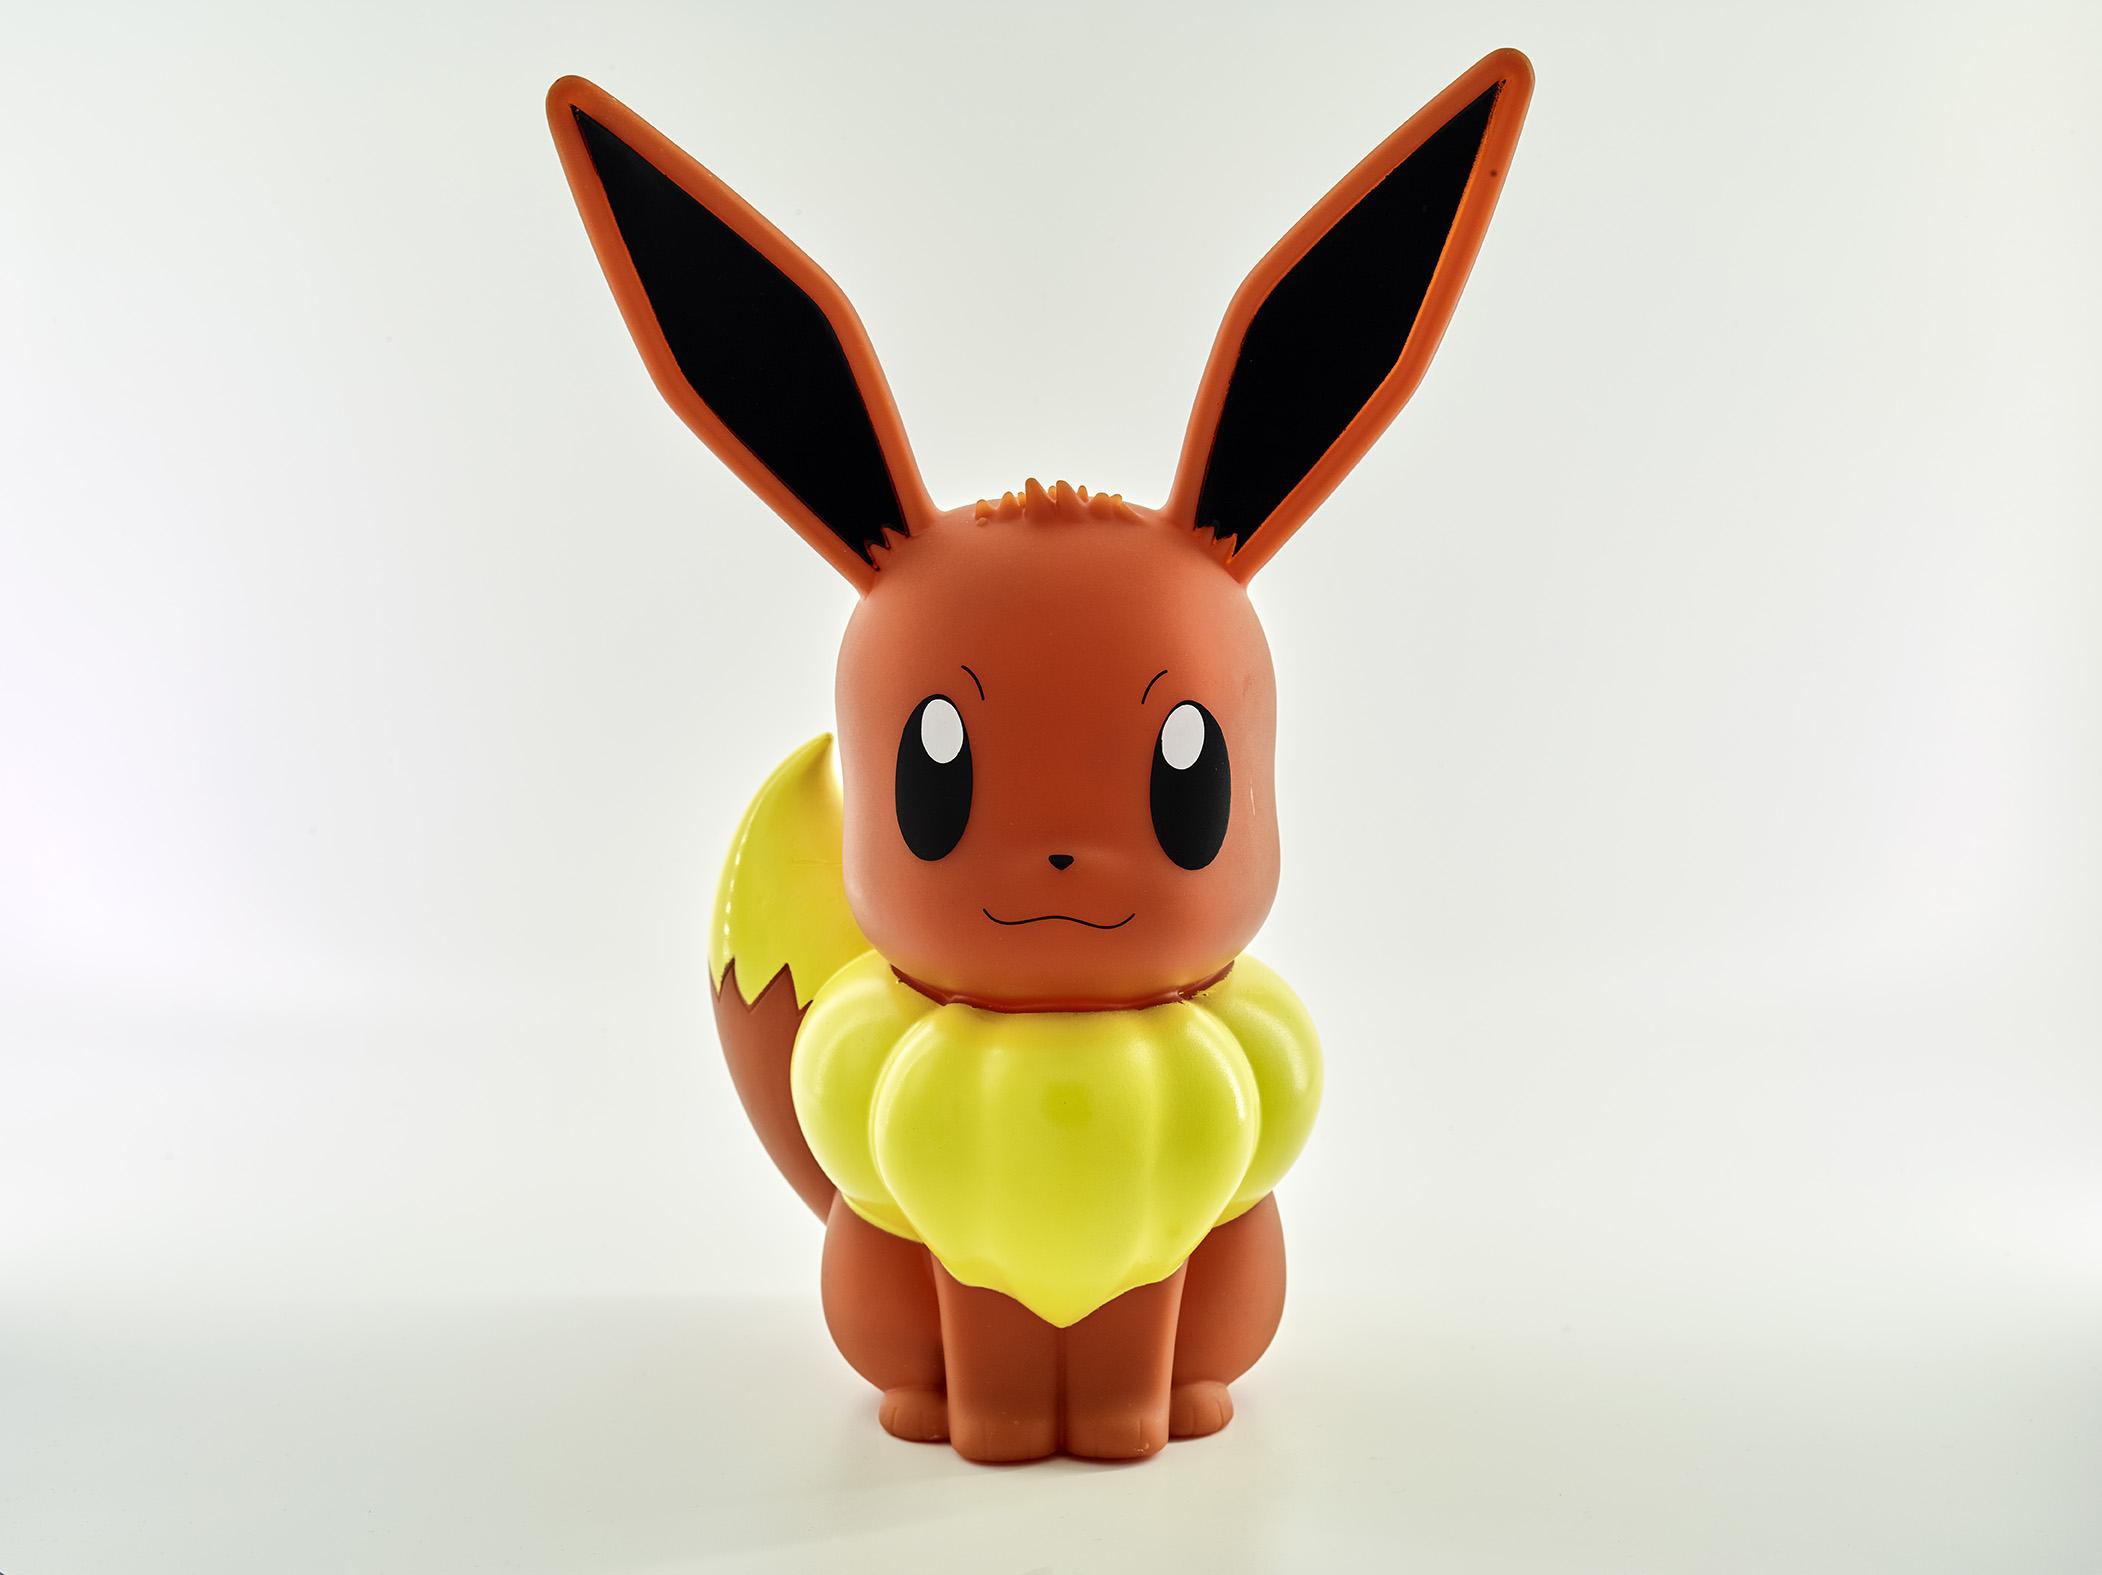 25cm Led Lampe Pokemon Eclairage Intérieur Eevee CxWBoerd